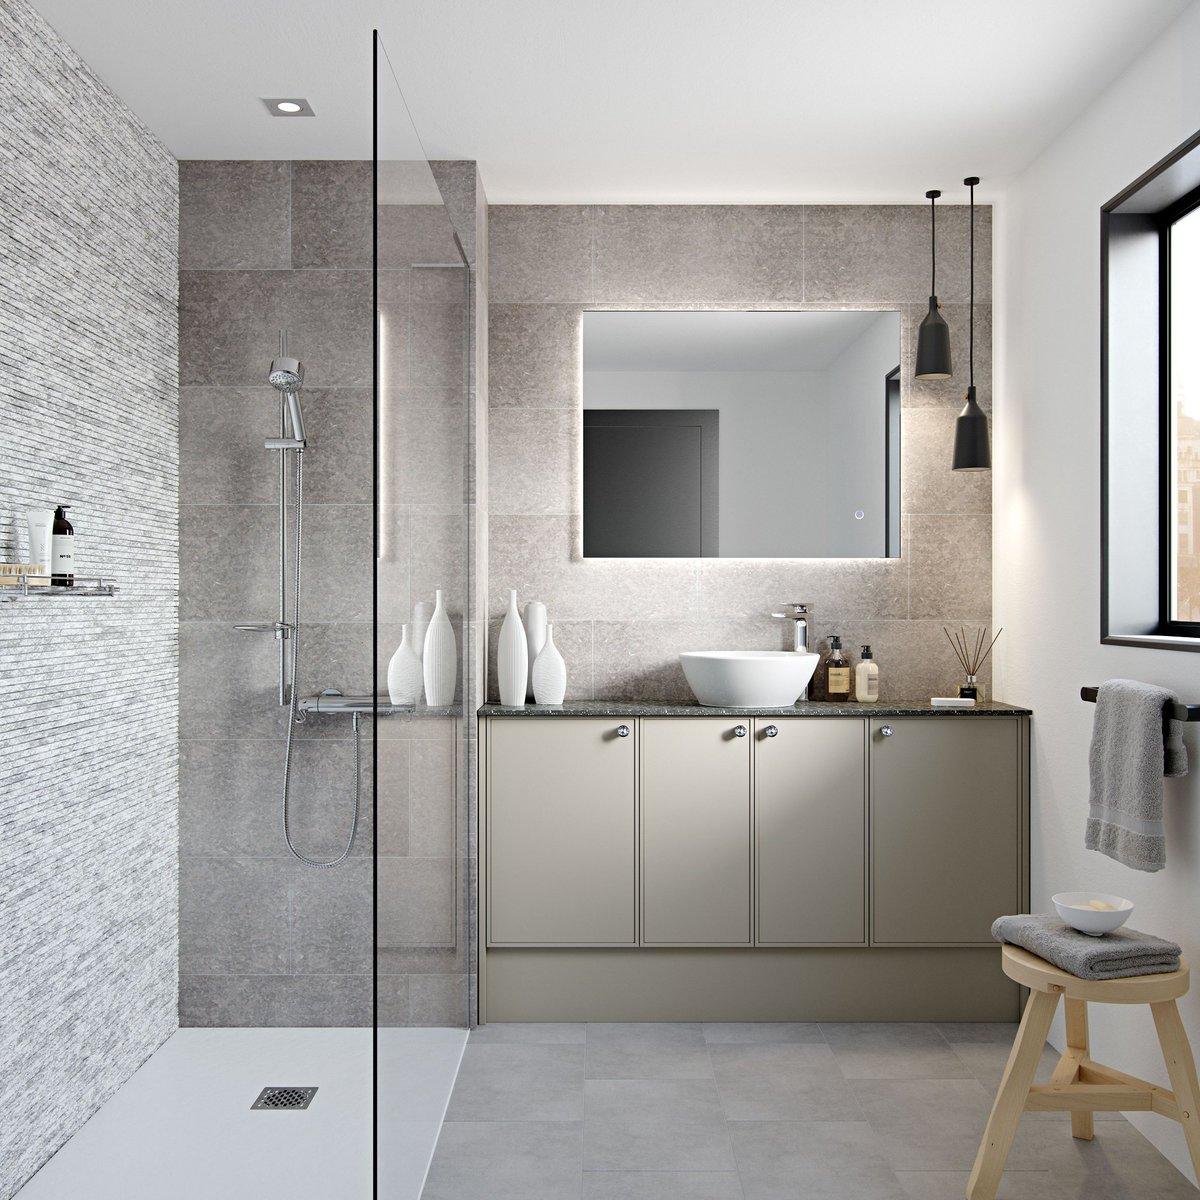 Mereway Bathrooms